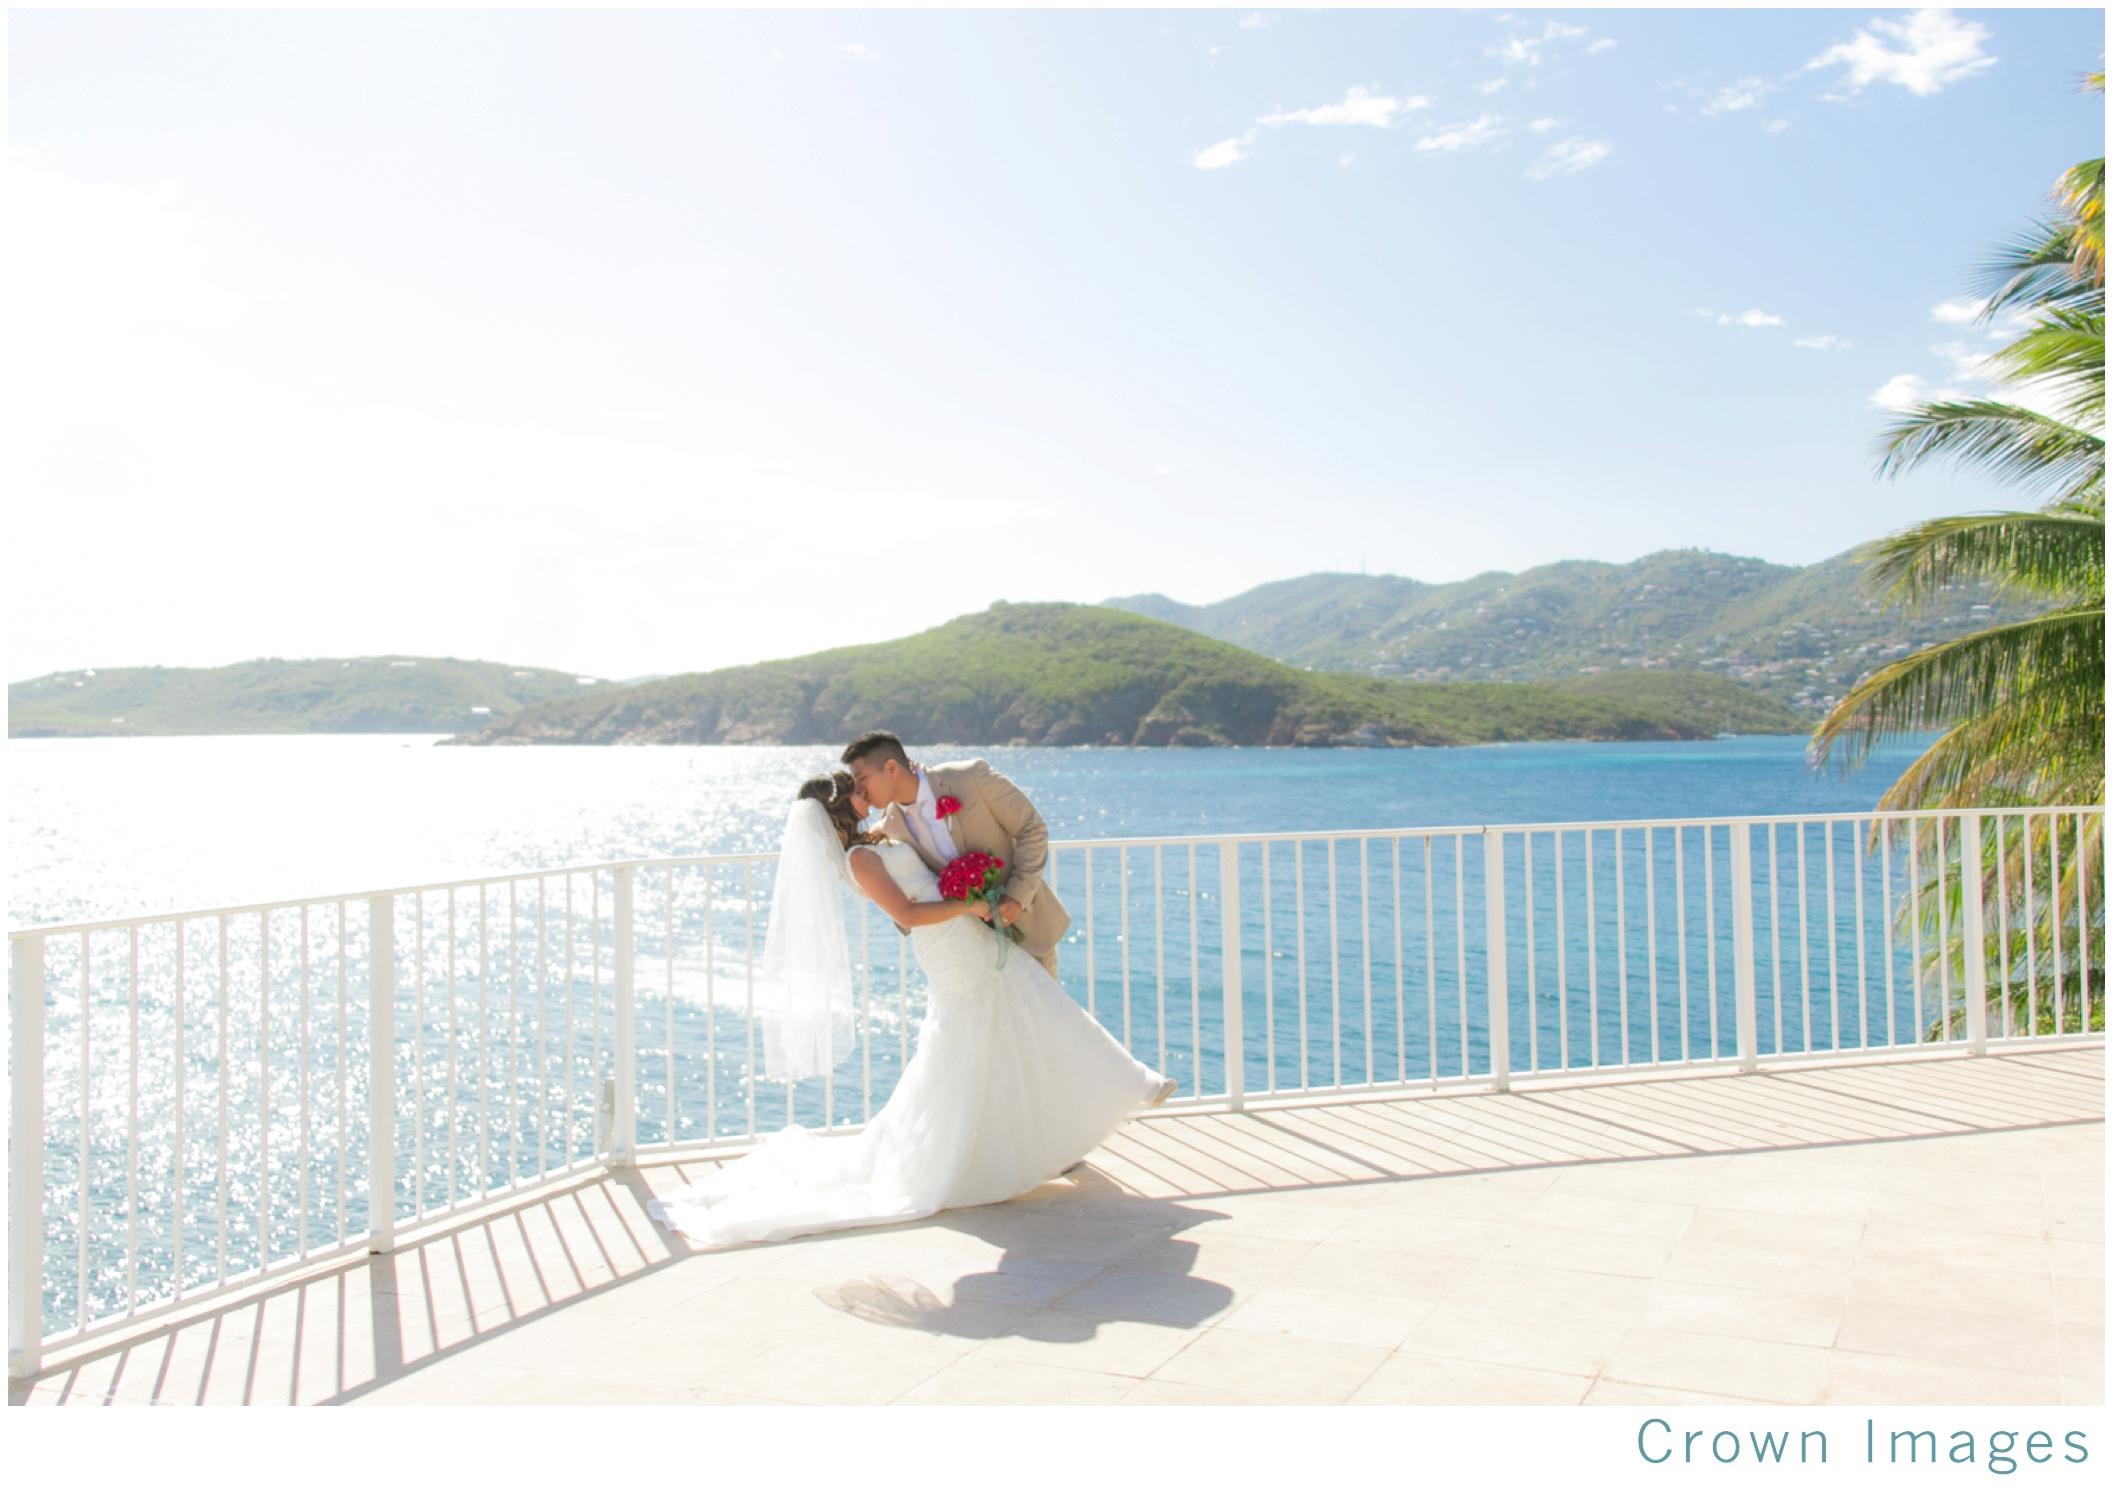 wedding-photos-st-thomas-marriott-frenchmans-reef_1815.jpg